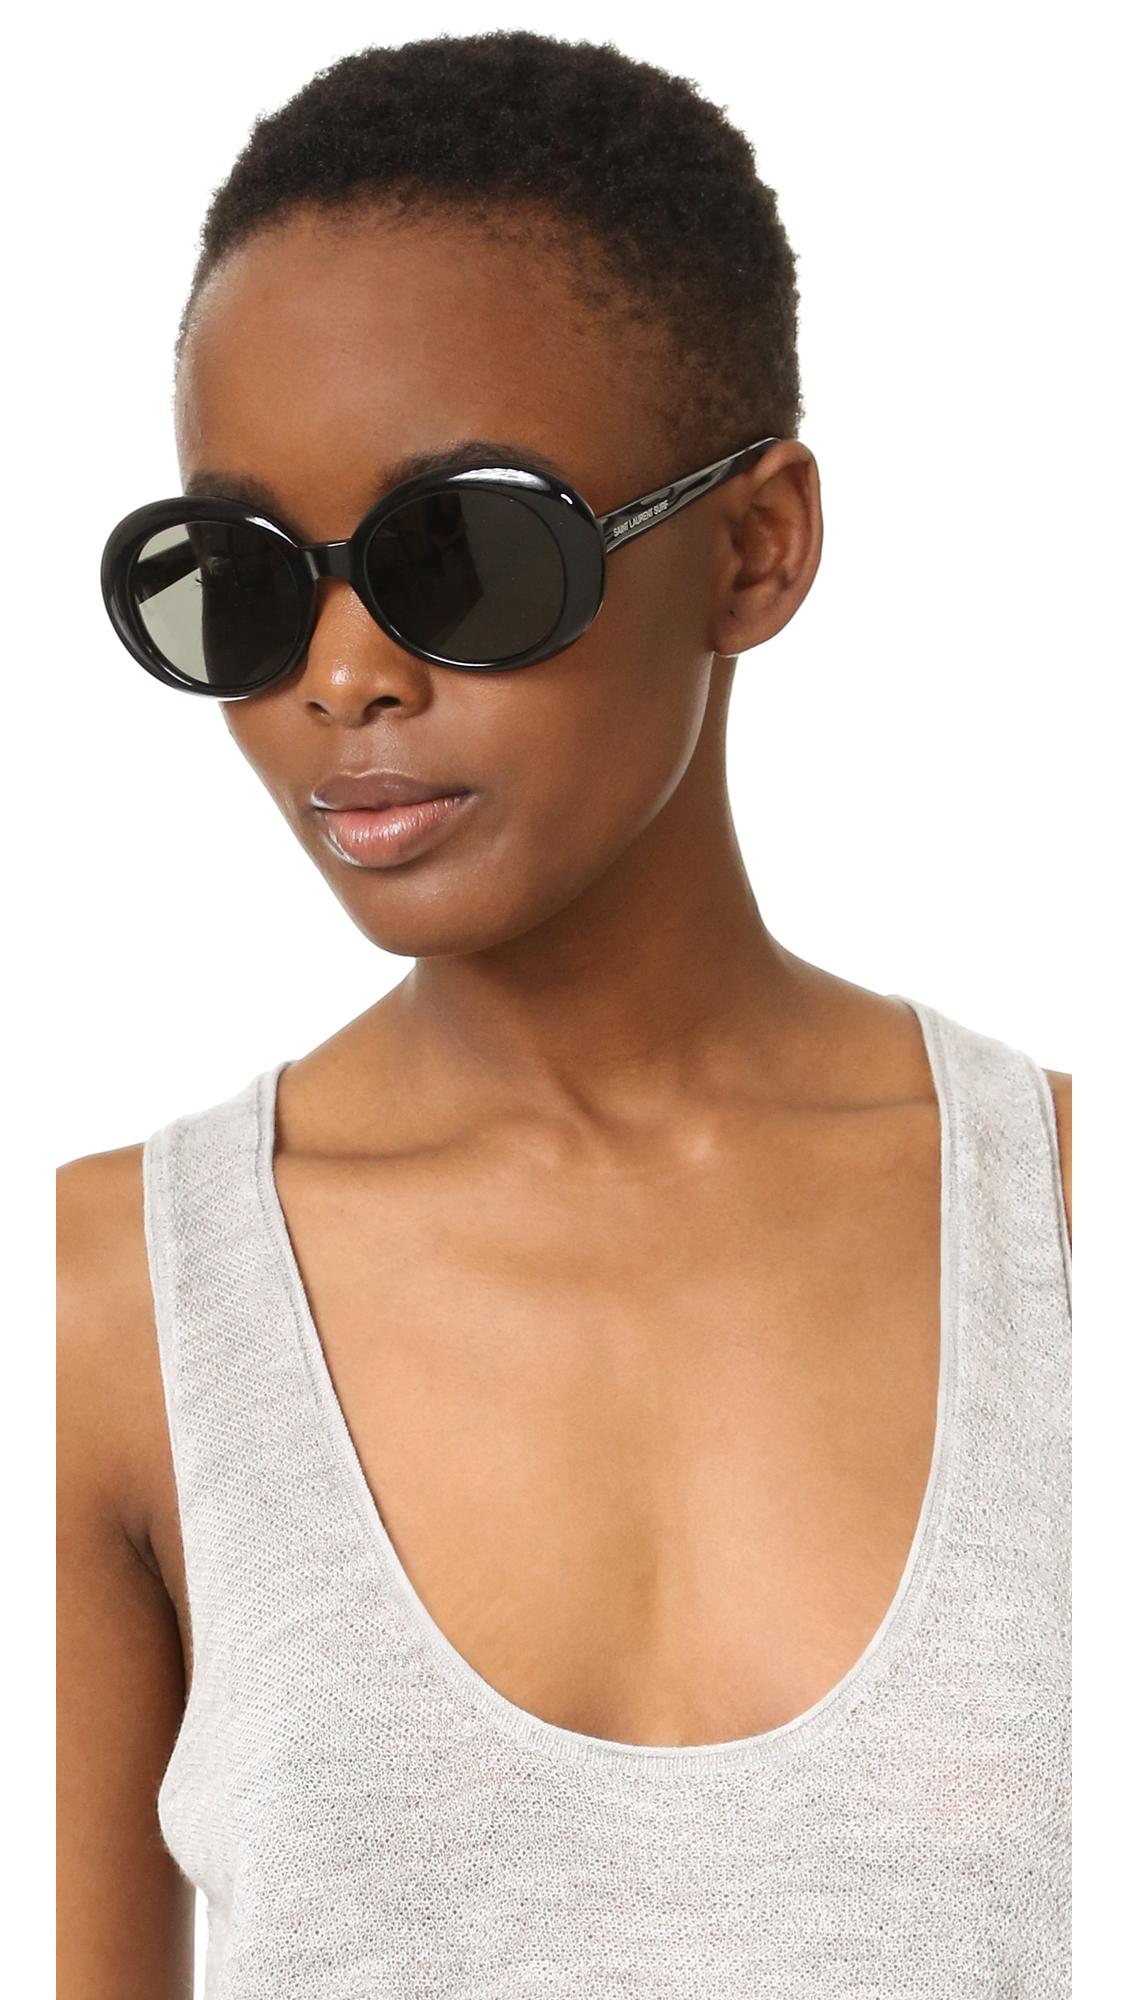 e5b1dbe1d3 Saint Laurent SL 98 California Sunglasses